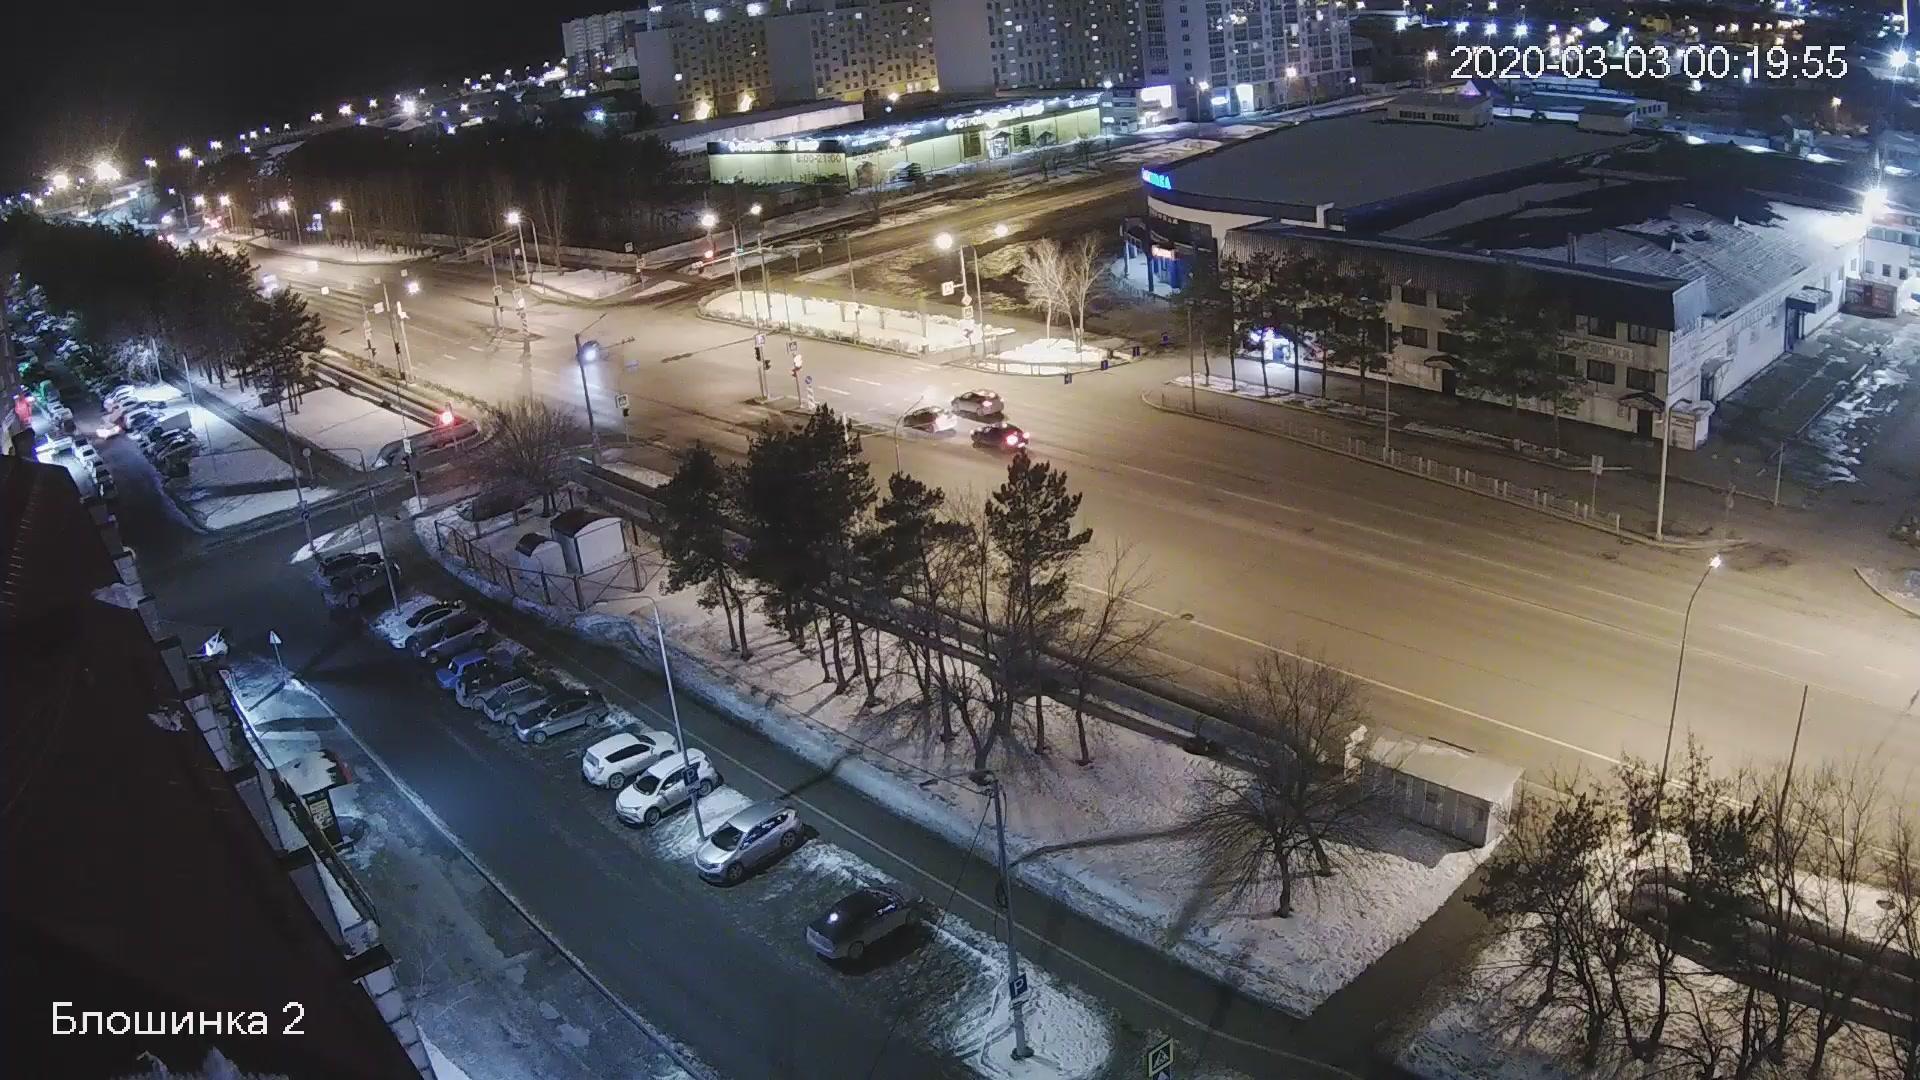 Webkamera Tyumen: Блошинка